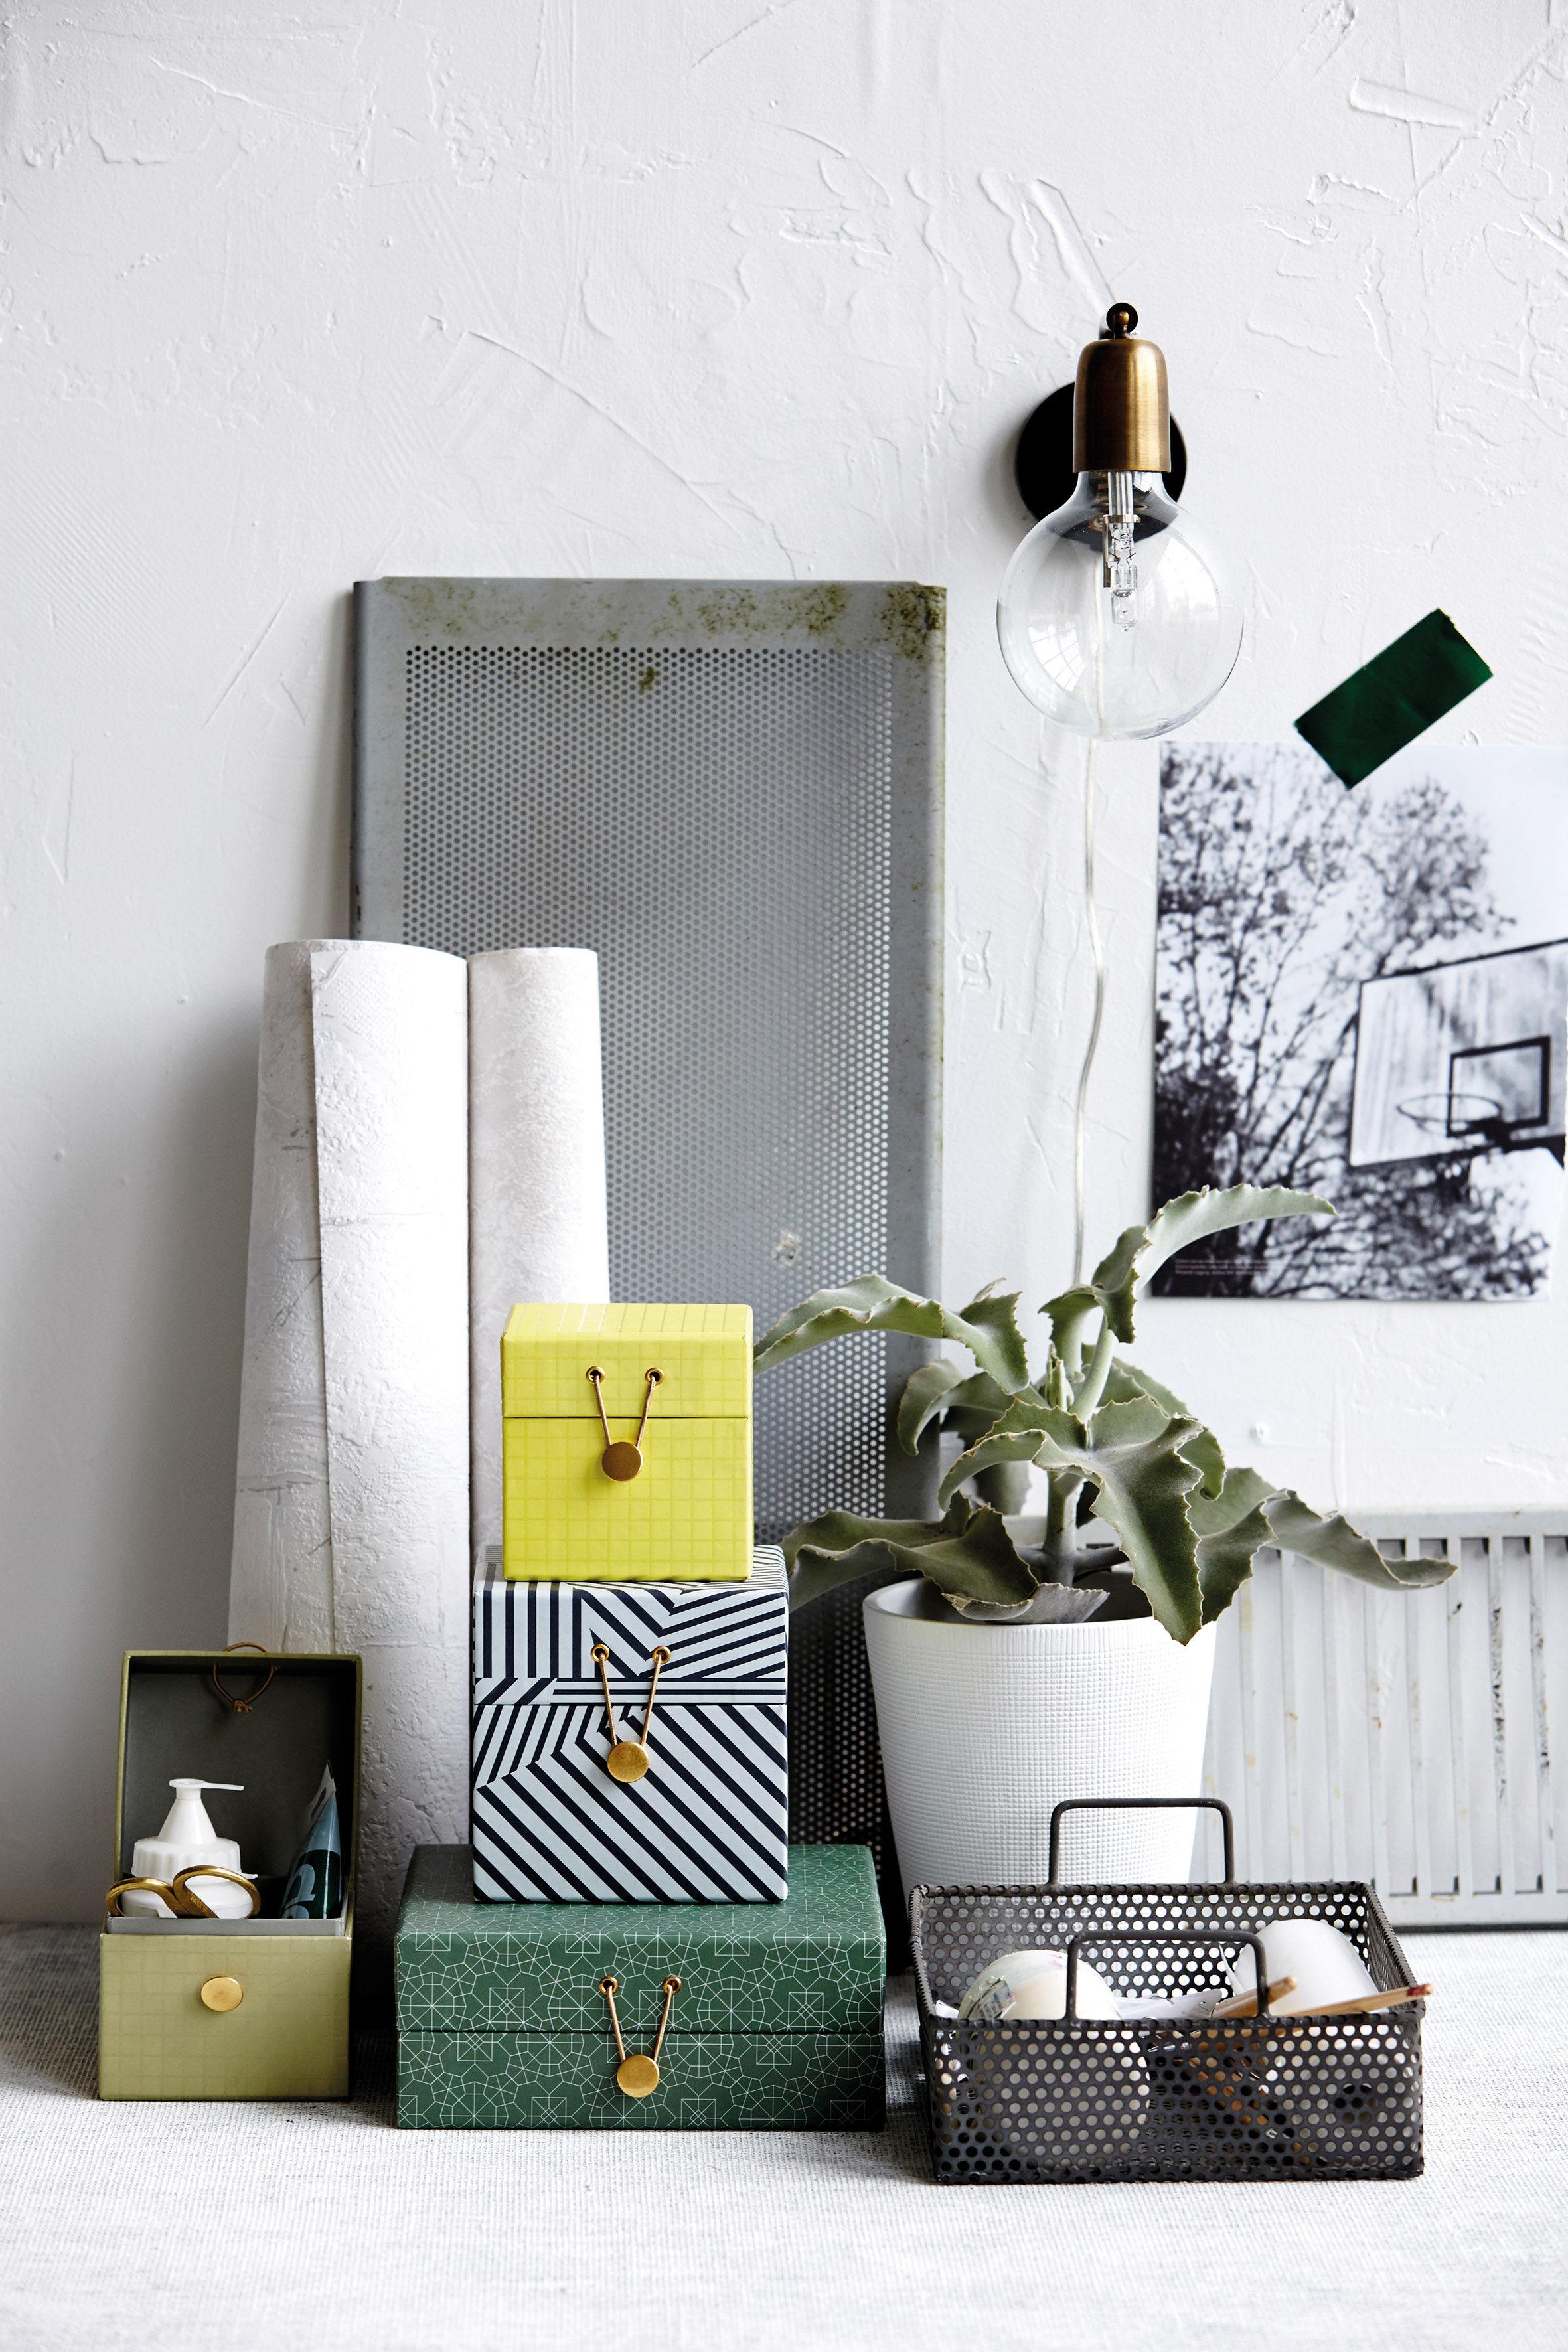 bo te the artwork large set de 2 vert tr s clair bleu house doctor. Black Bedroom Furniture Sets. Home Design Ideas